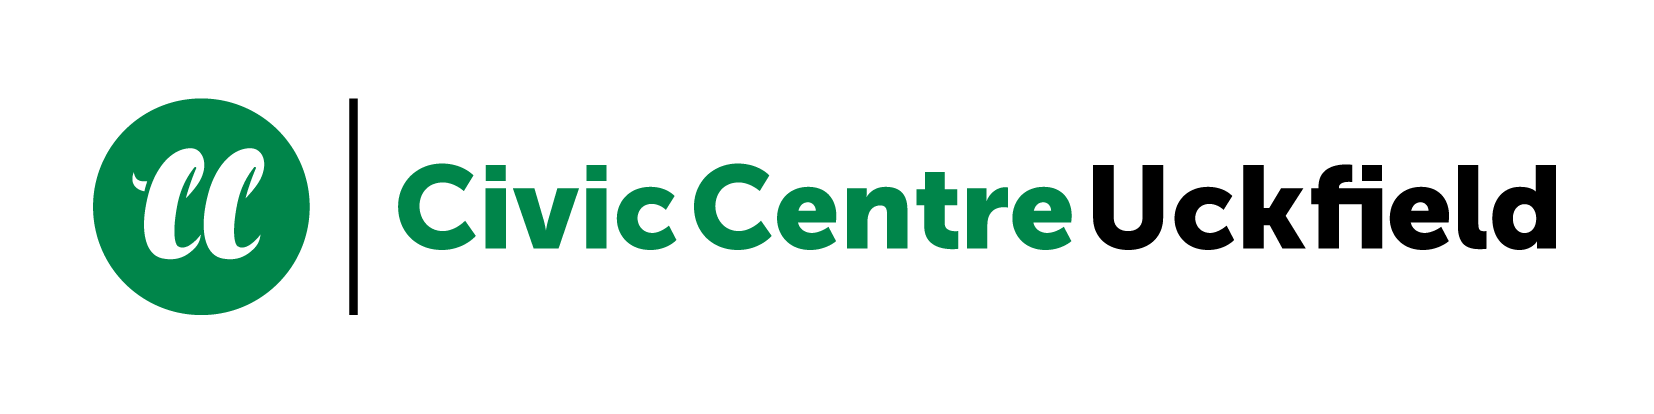 Uckfield Civic Centre